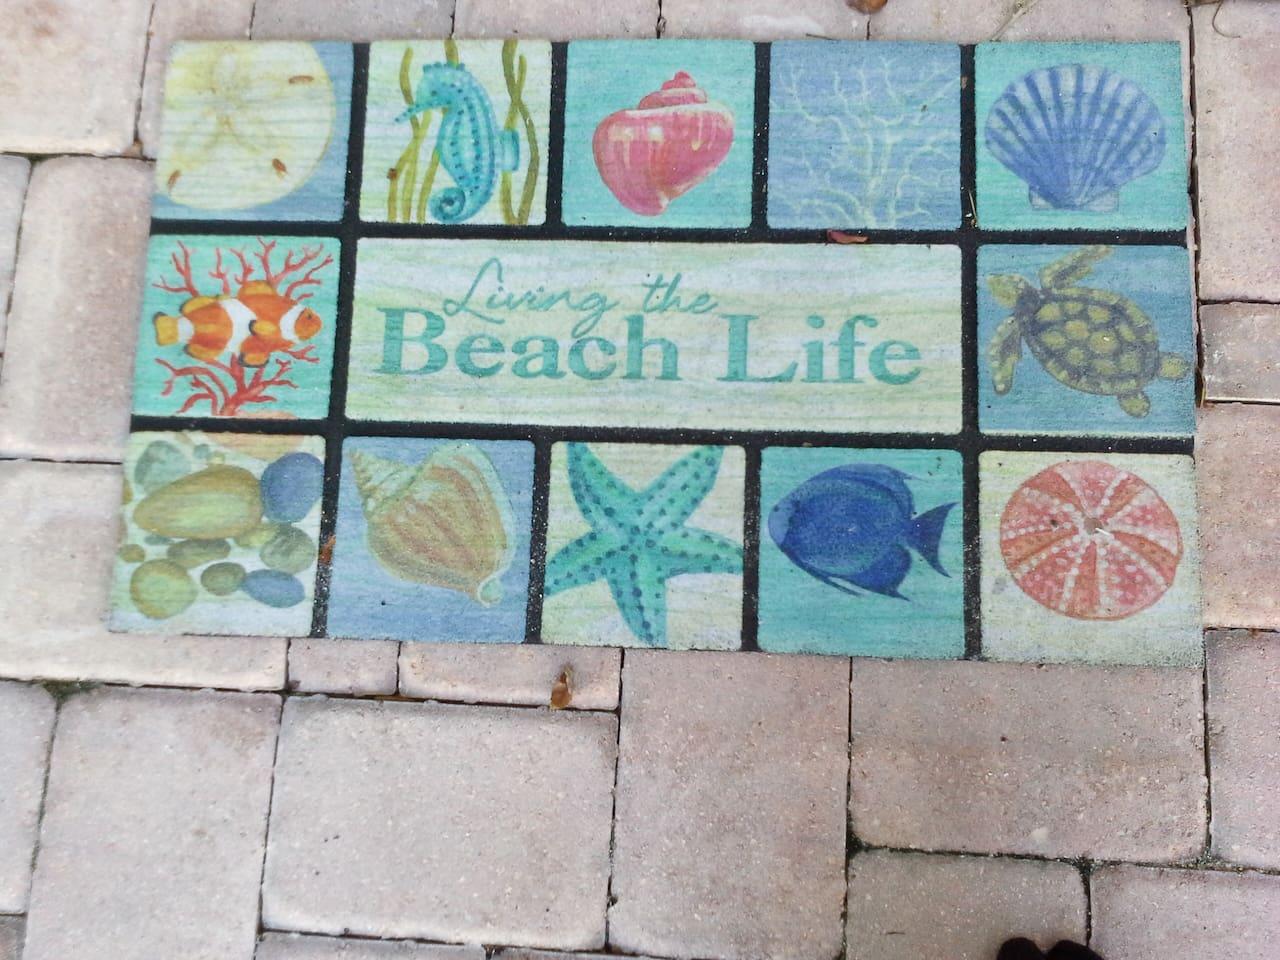 LIVING THE BEACH LIFE!  6 short minutes to BEACH!